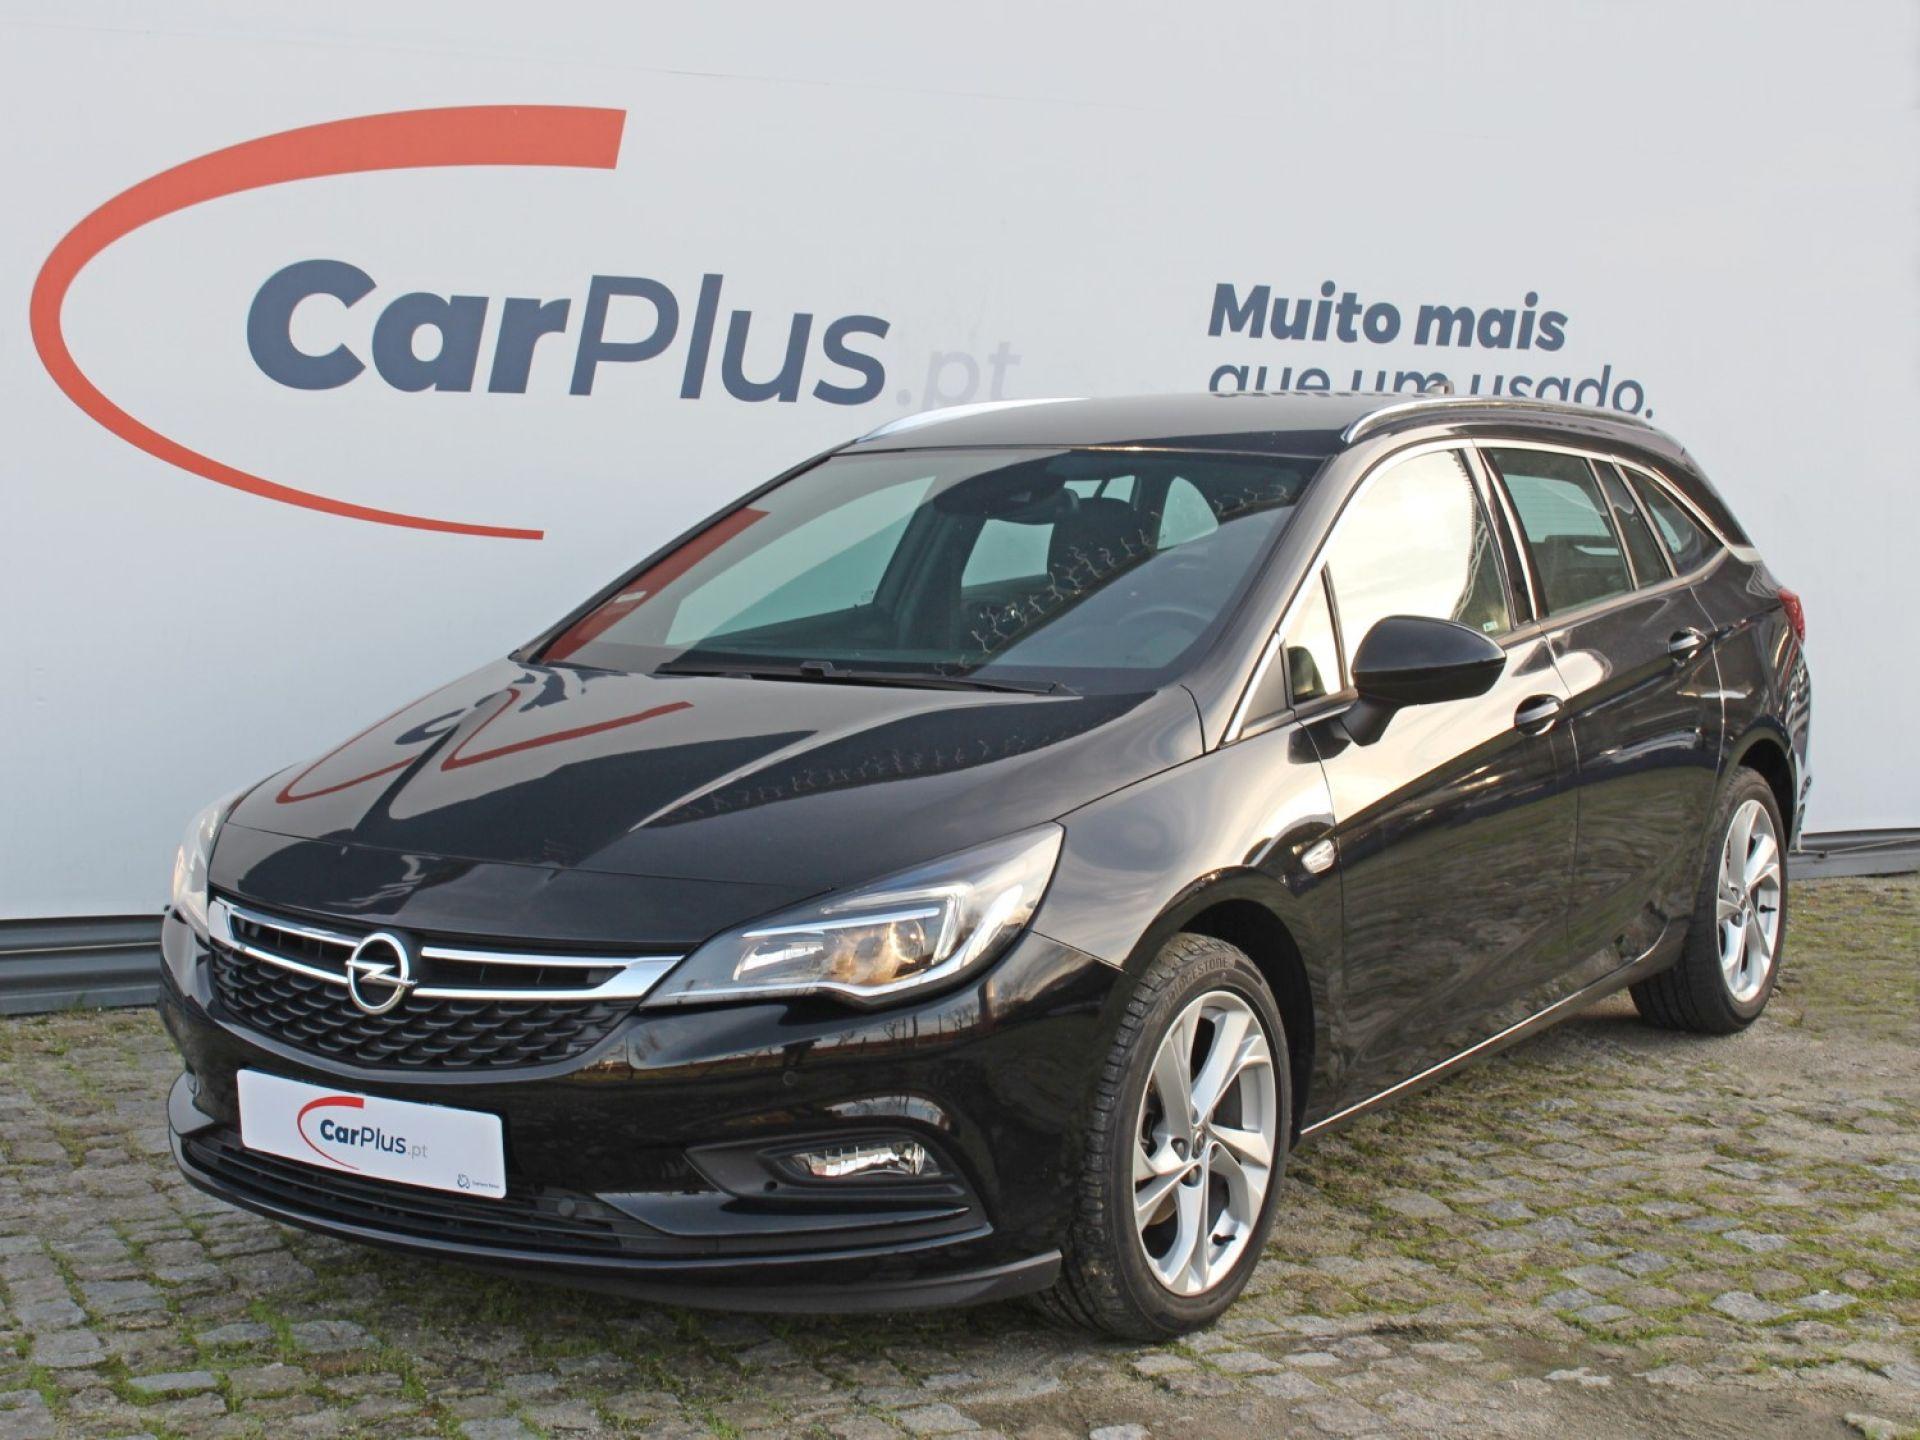 Opel Astra 1.6 Turbo D 110cv S/S JL17 Innovation ST segunda mão Porto